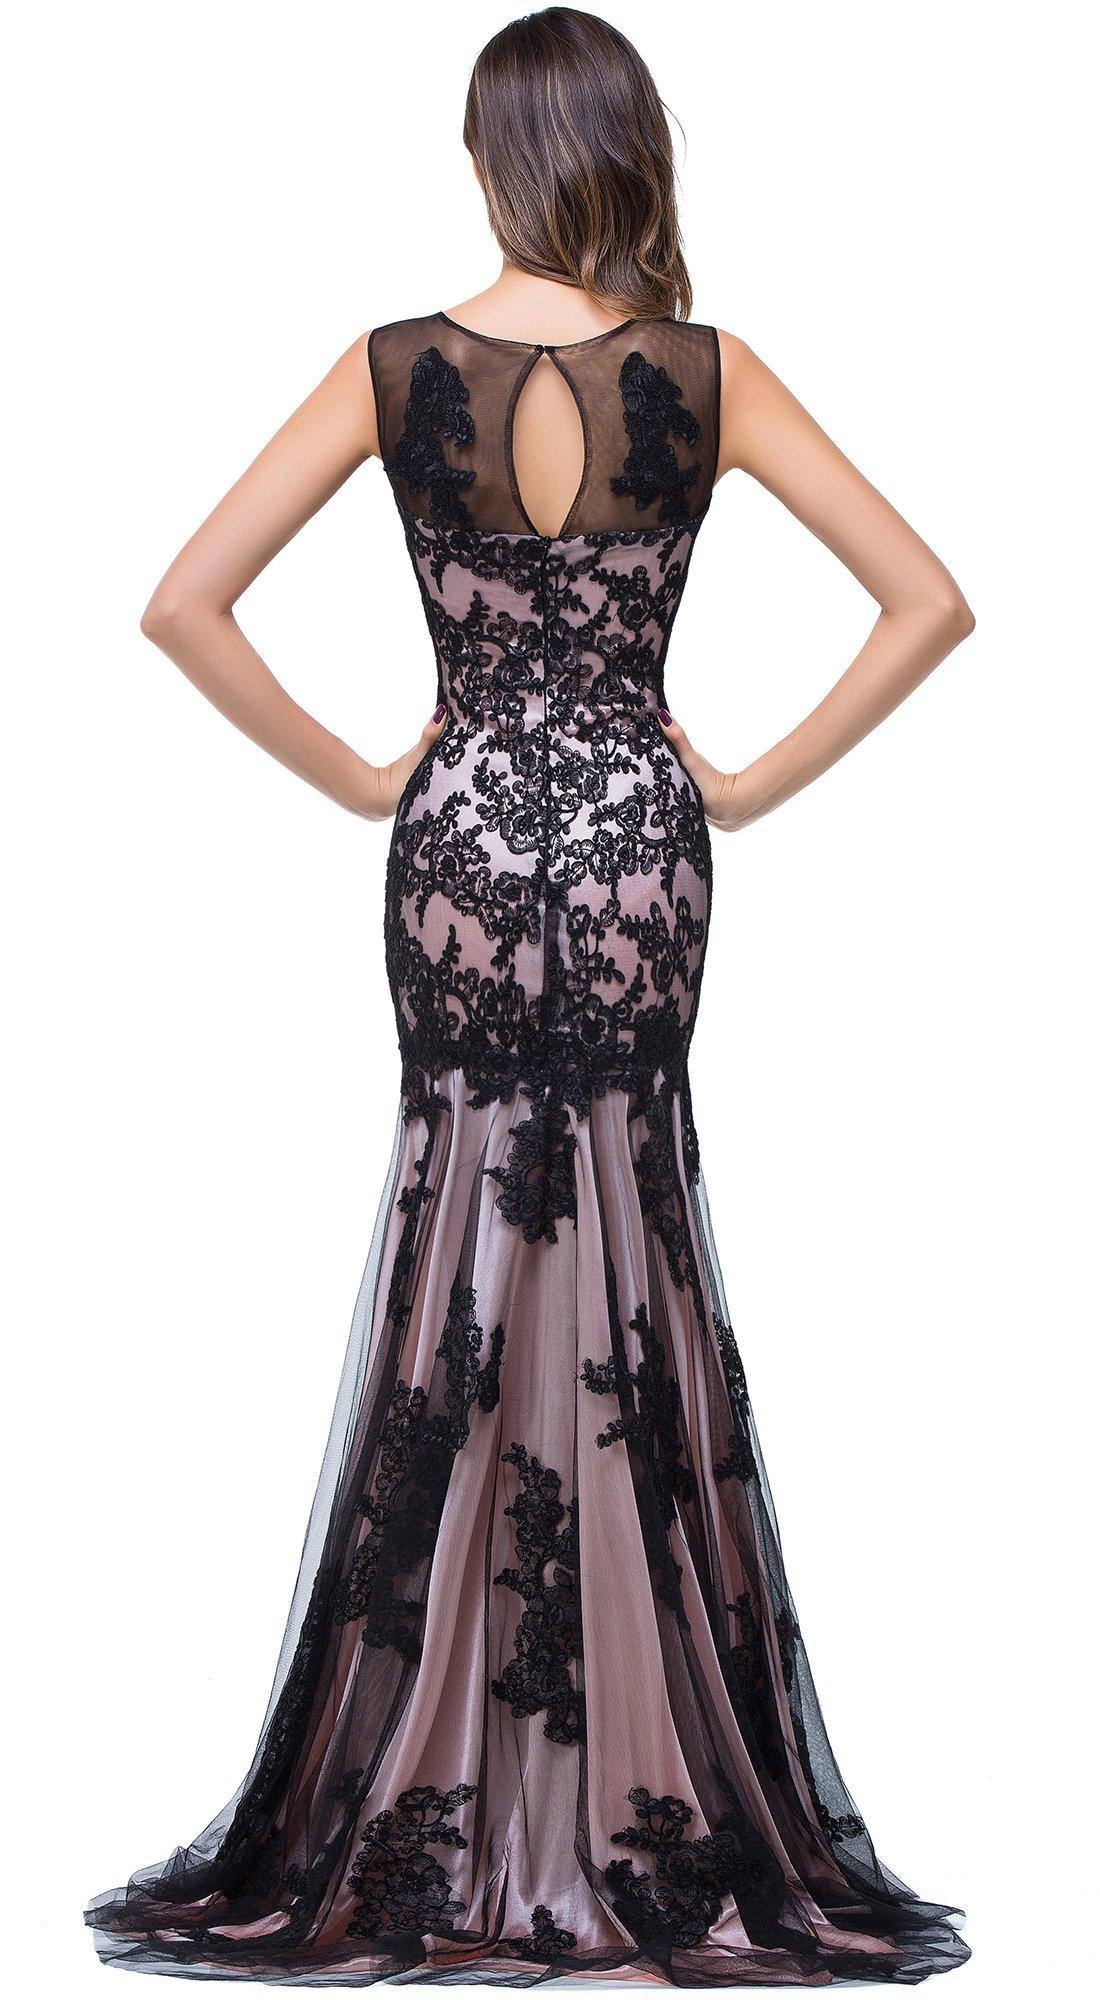 Babyonlinedress 2016 Scoop neck Mermaid Black lace Applique Evening Prom dress Black 6